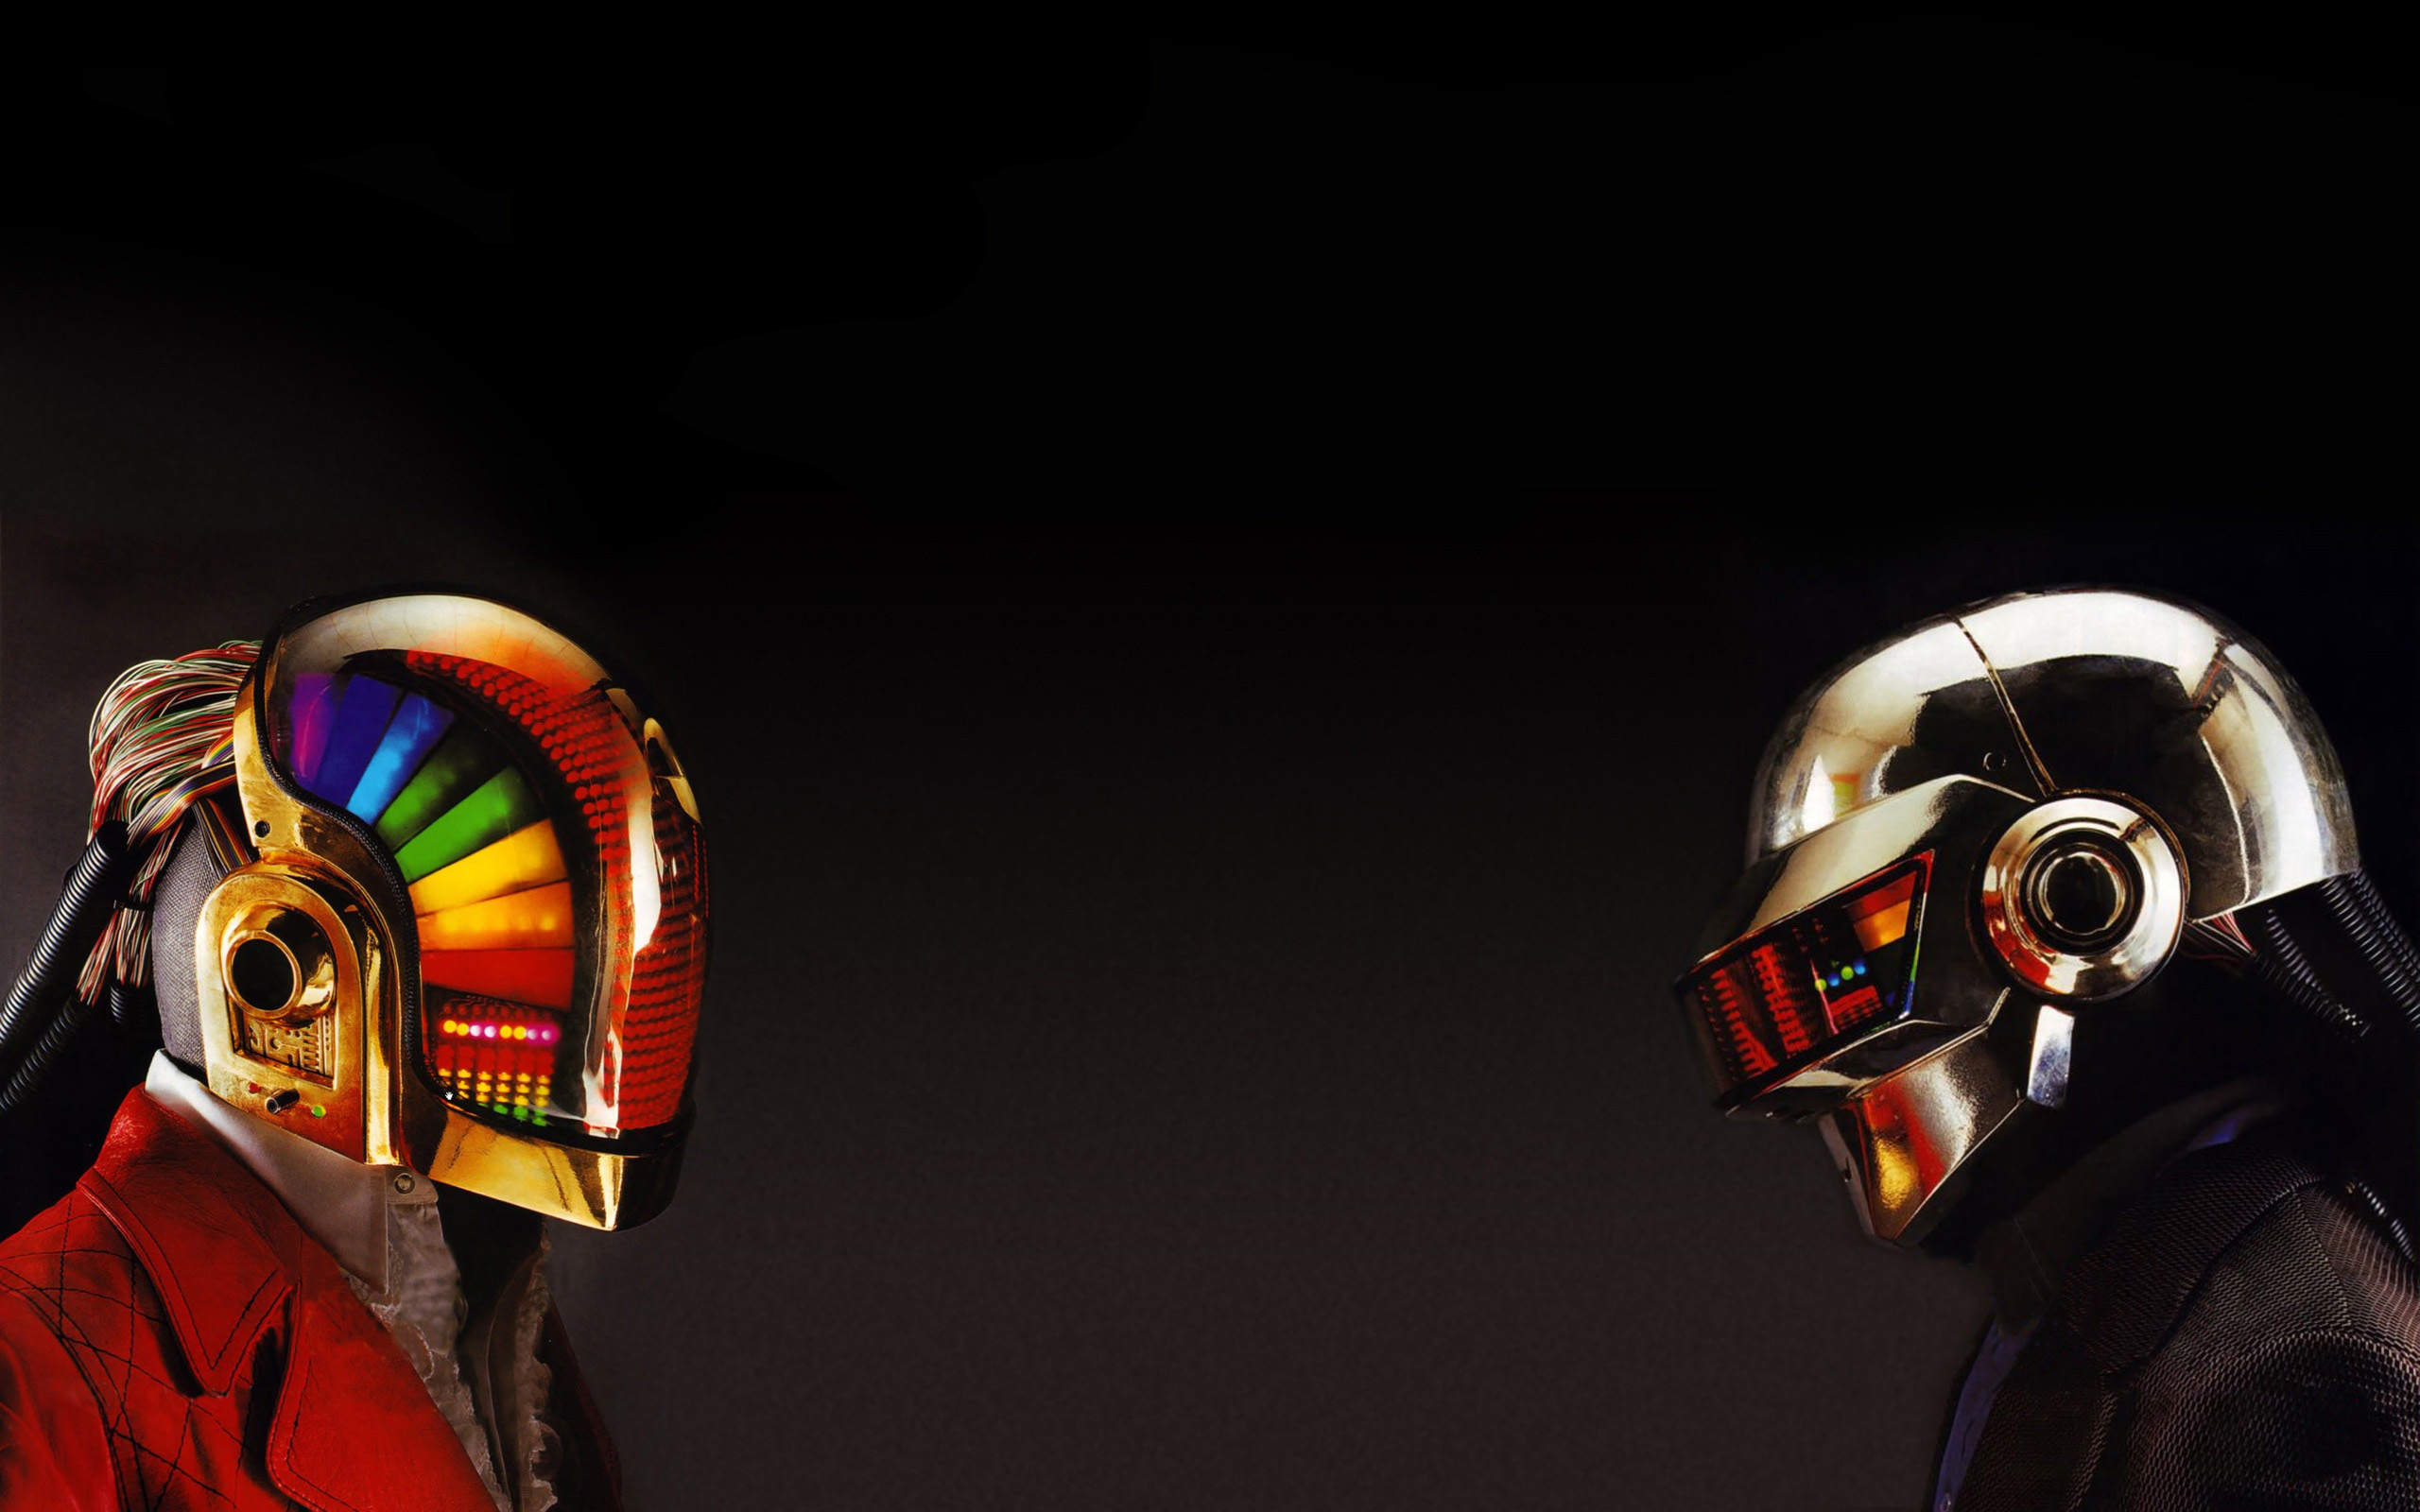 Daft Punk Res: 2560x1600 / Size:480kb. Views: 380975